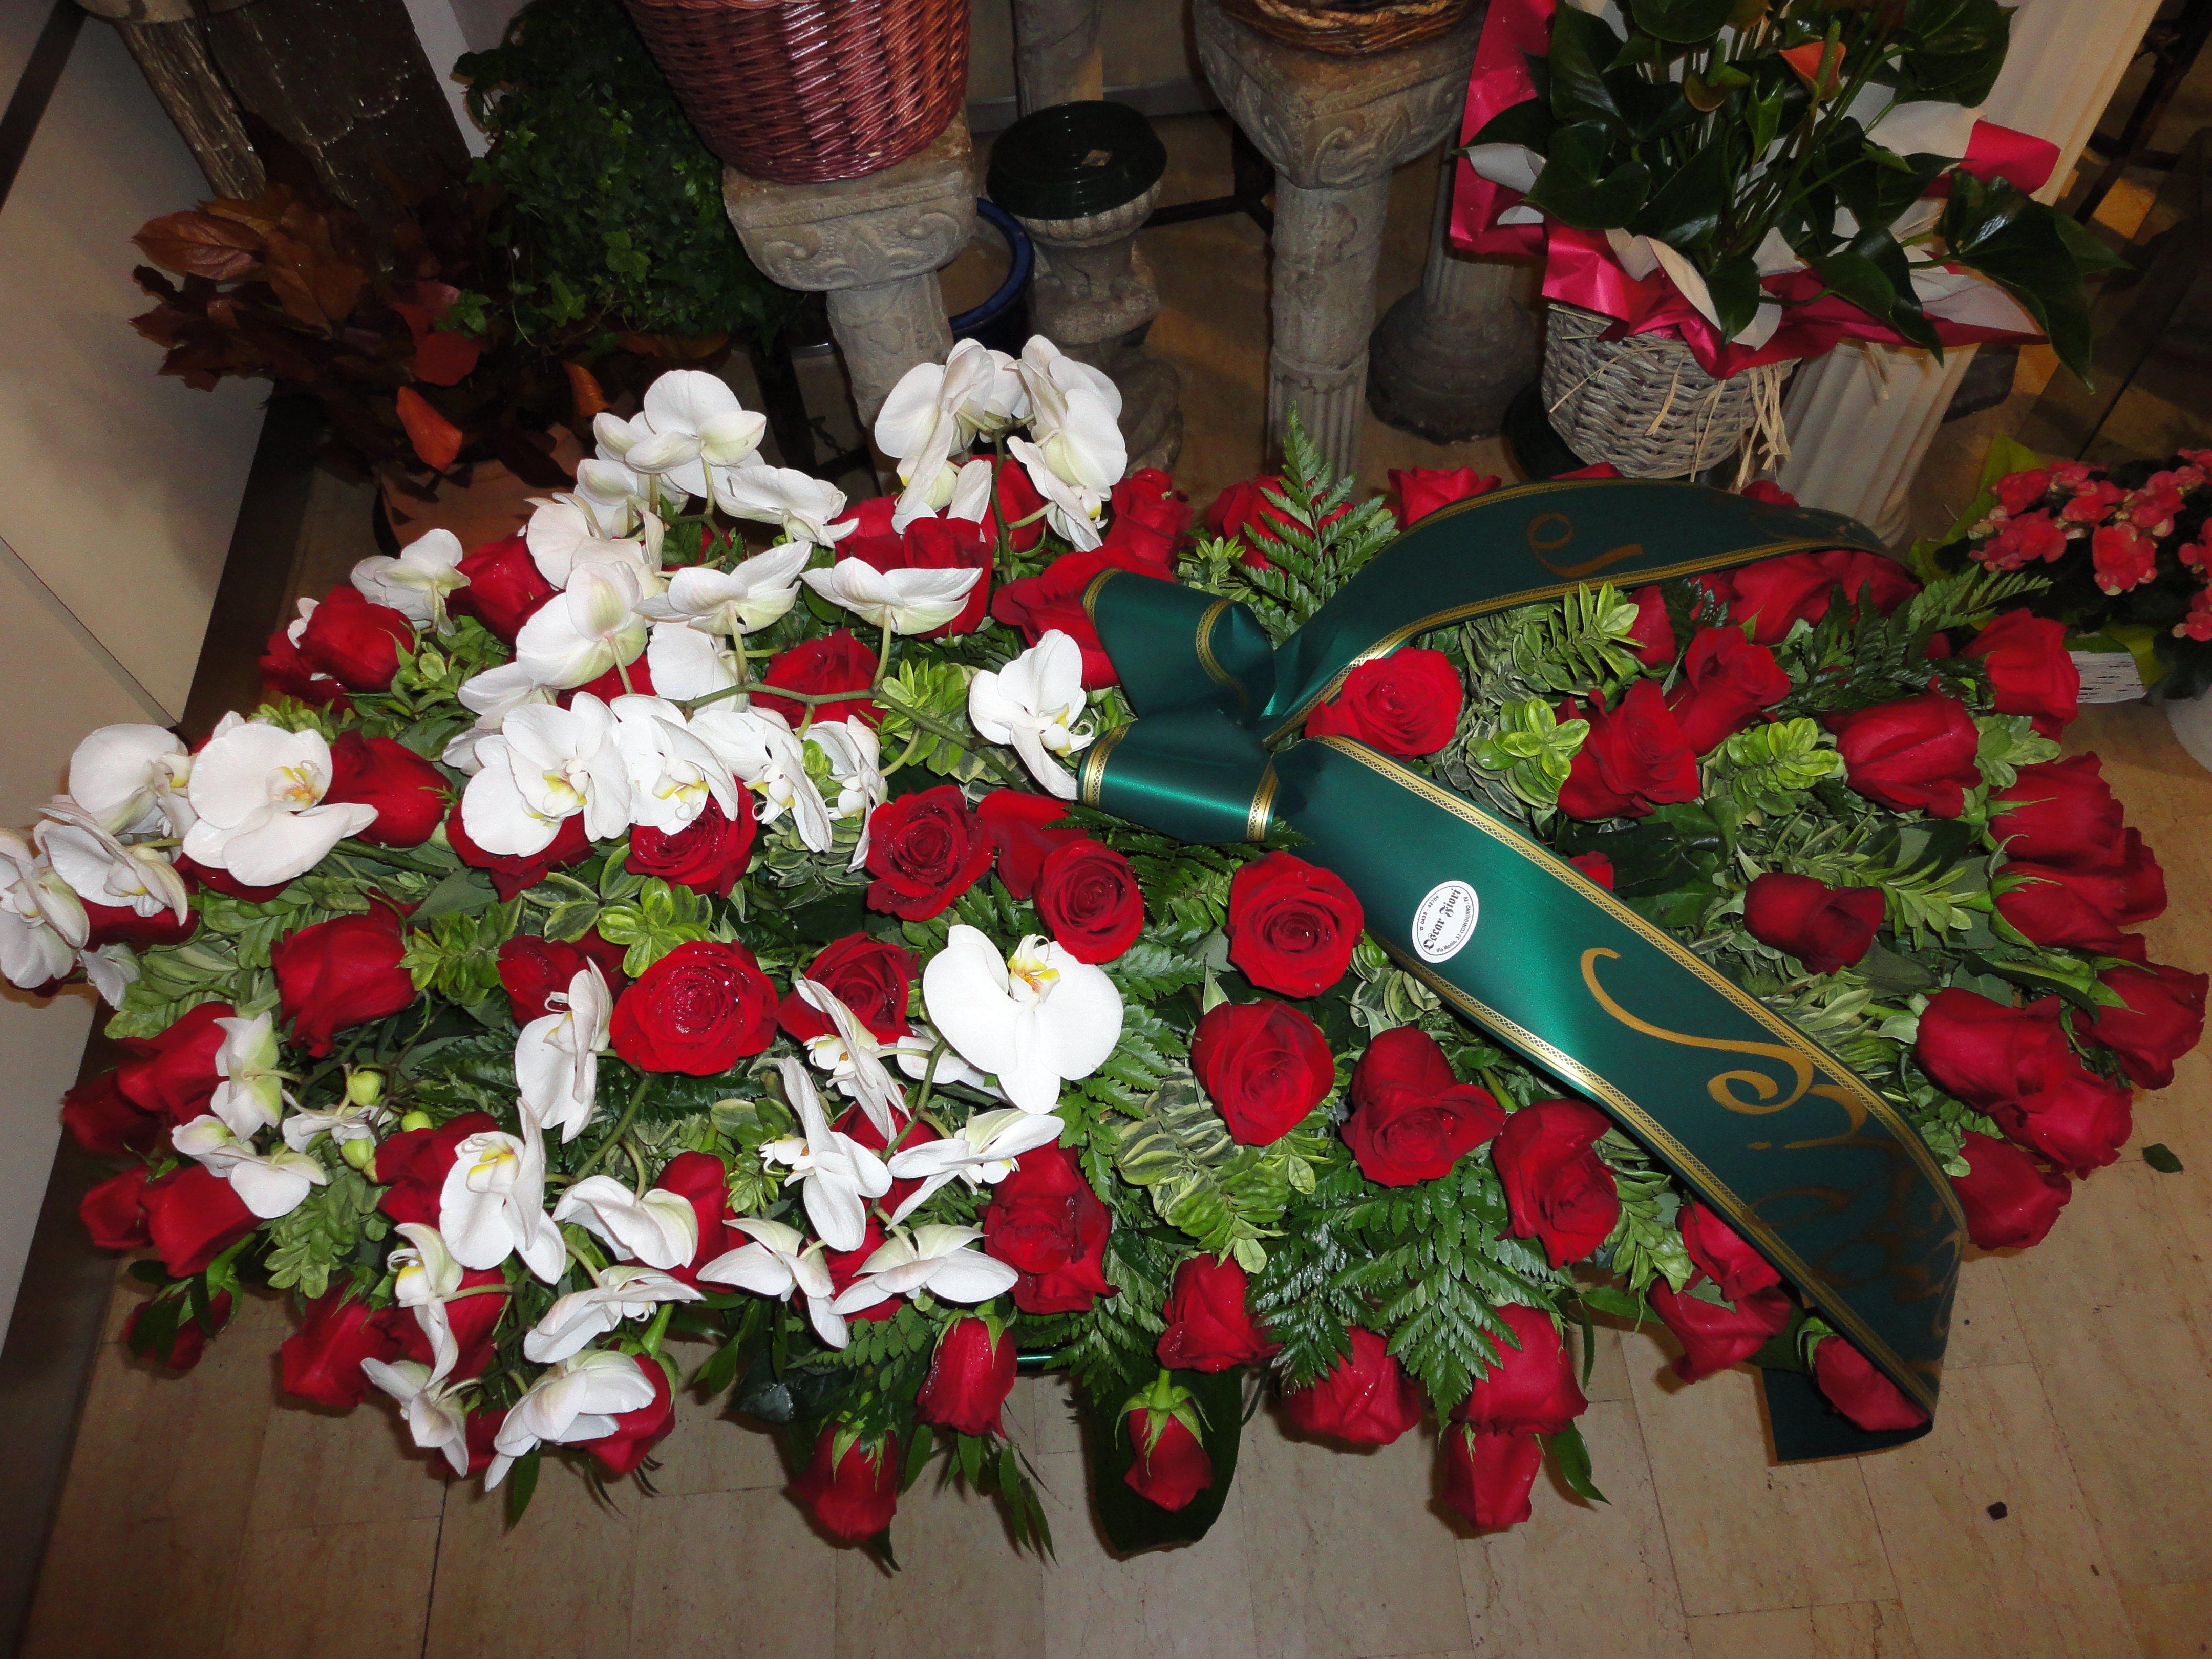 copricassa di rose rosse e fiori bianchi da morto